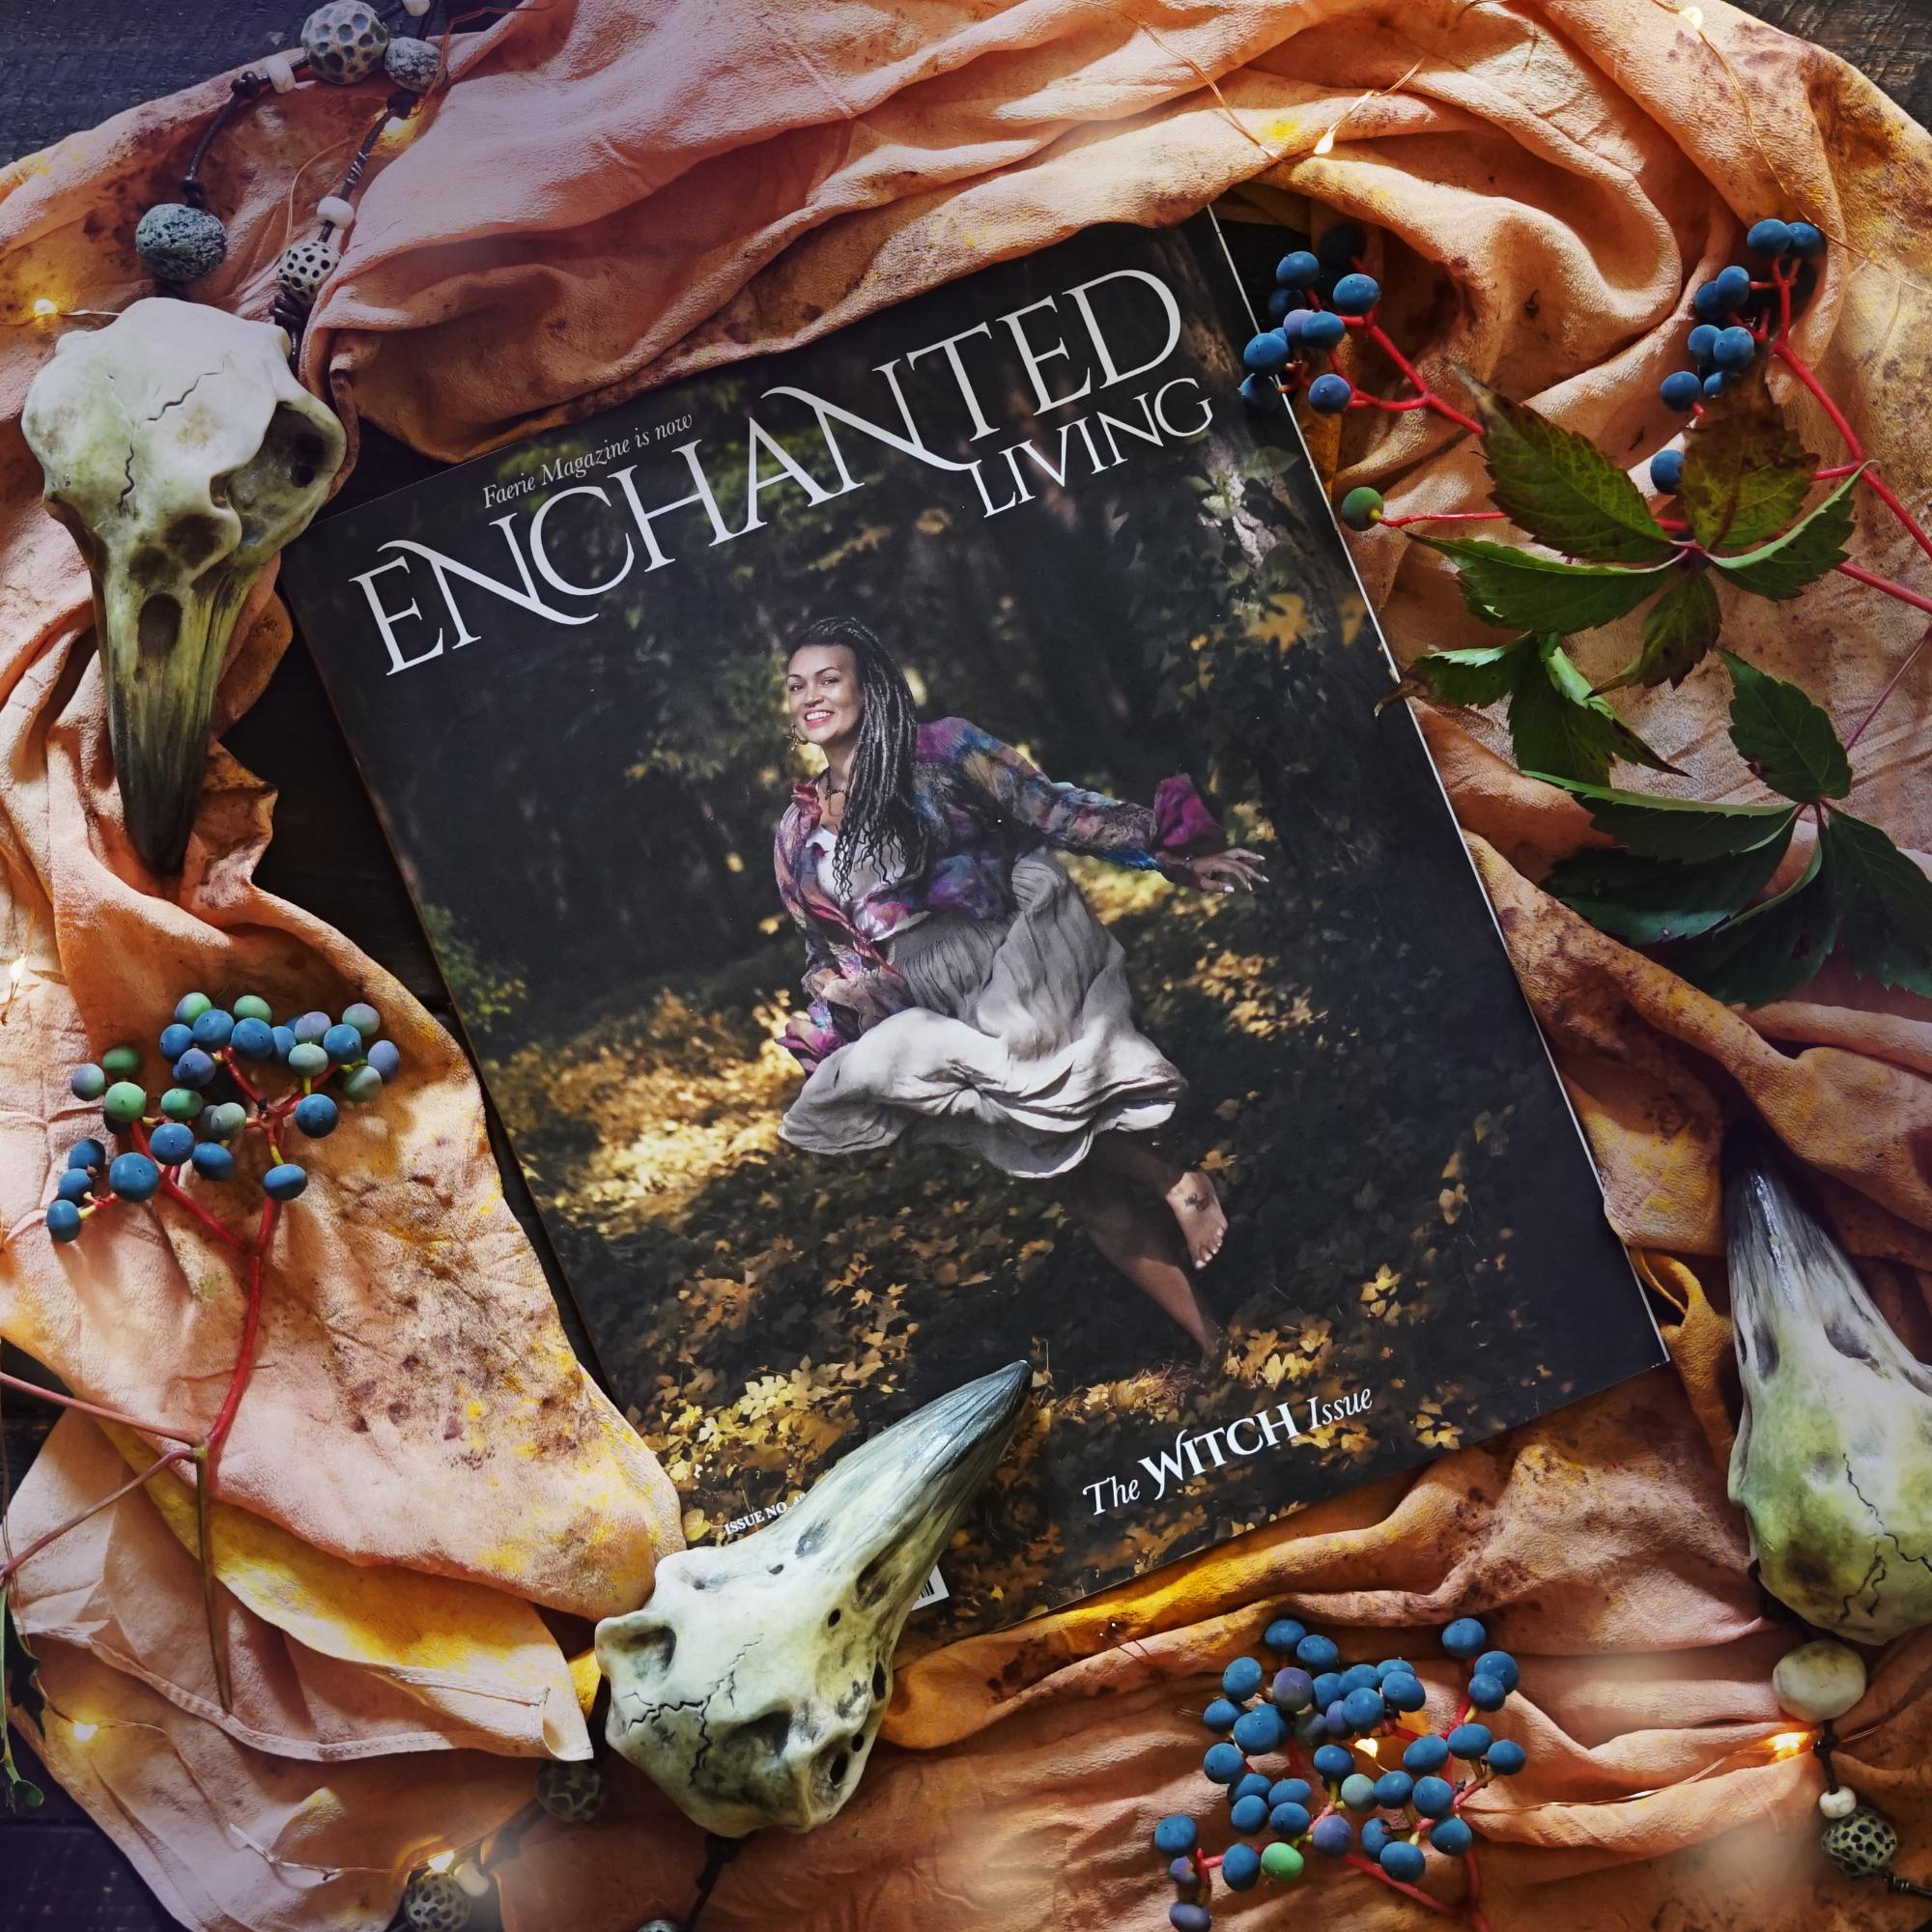 enchanted living fall 19 1.jpg